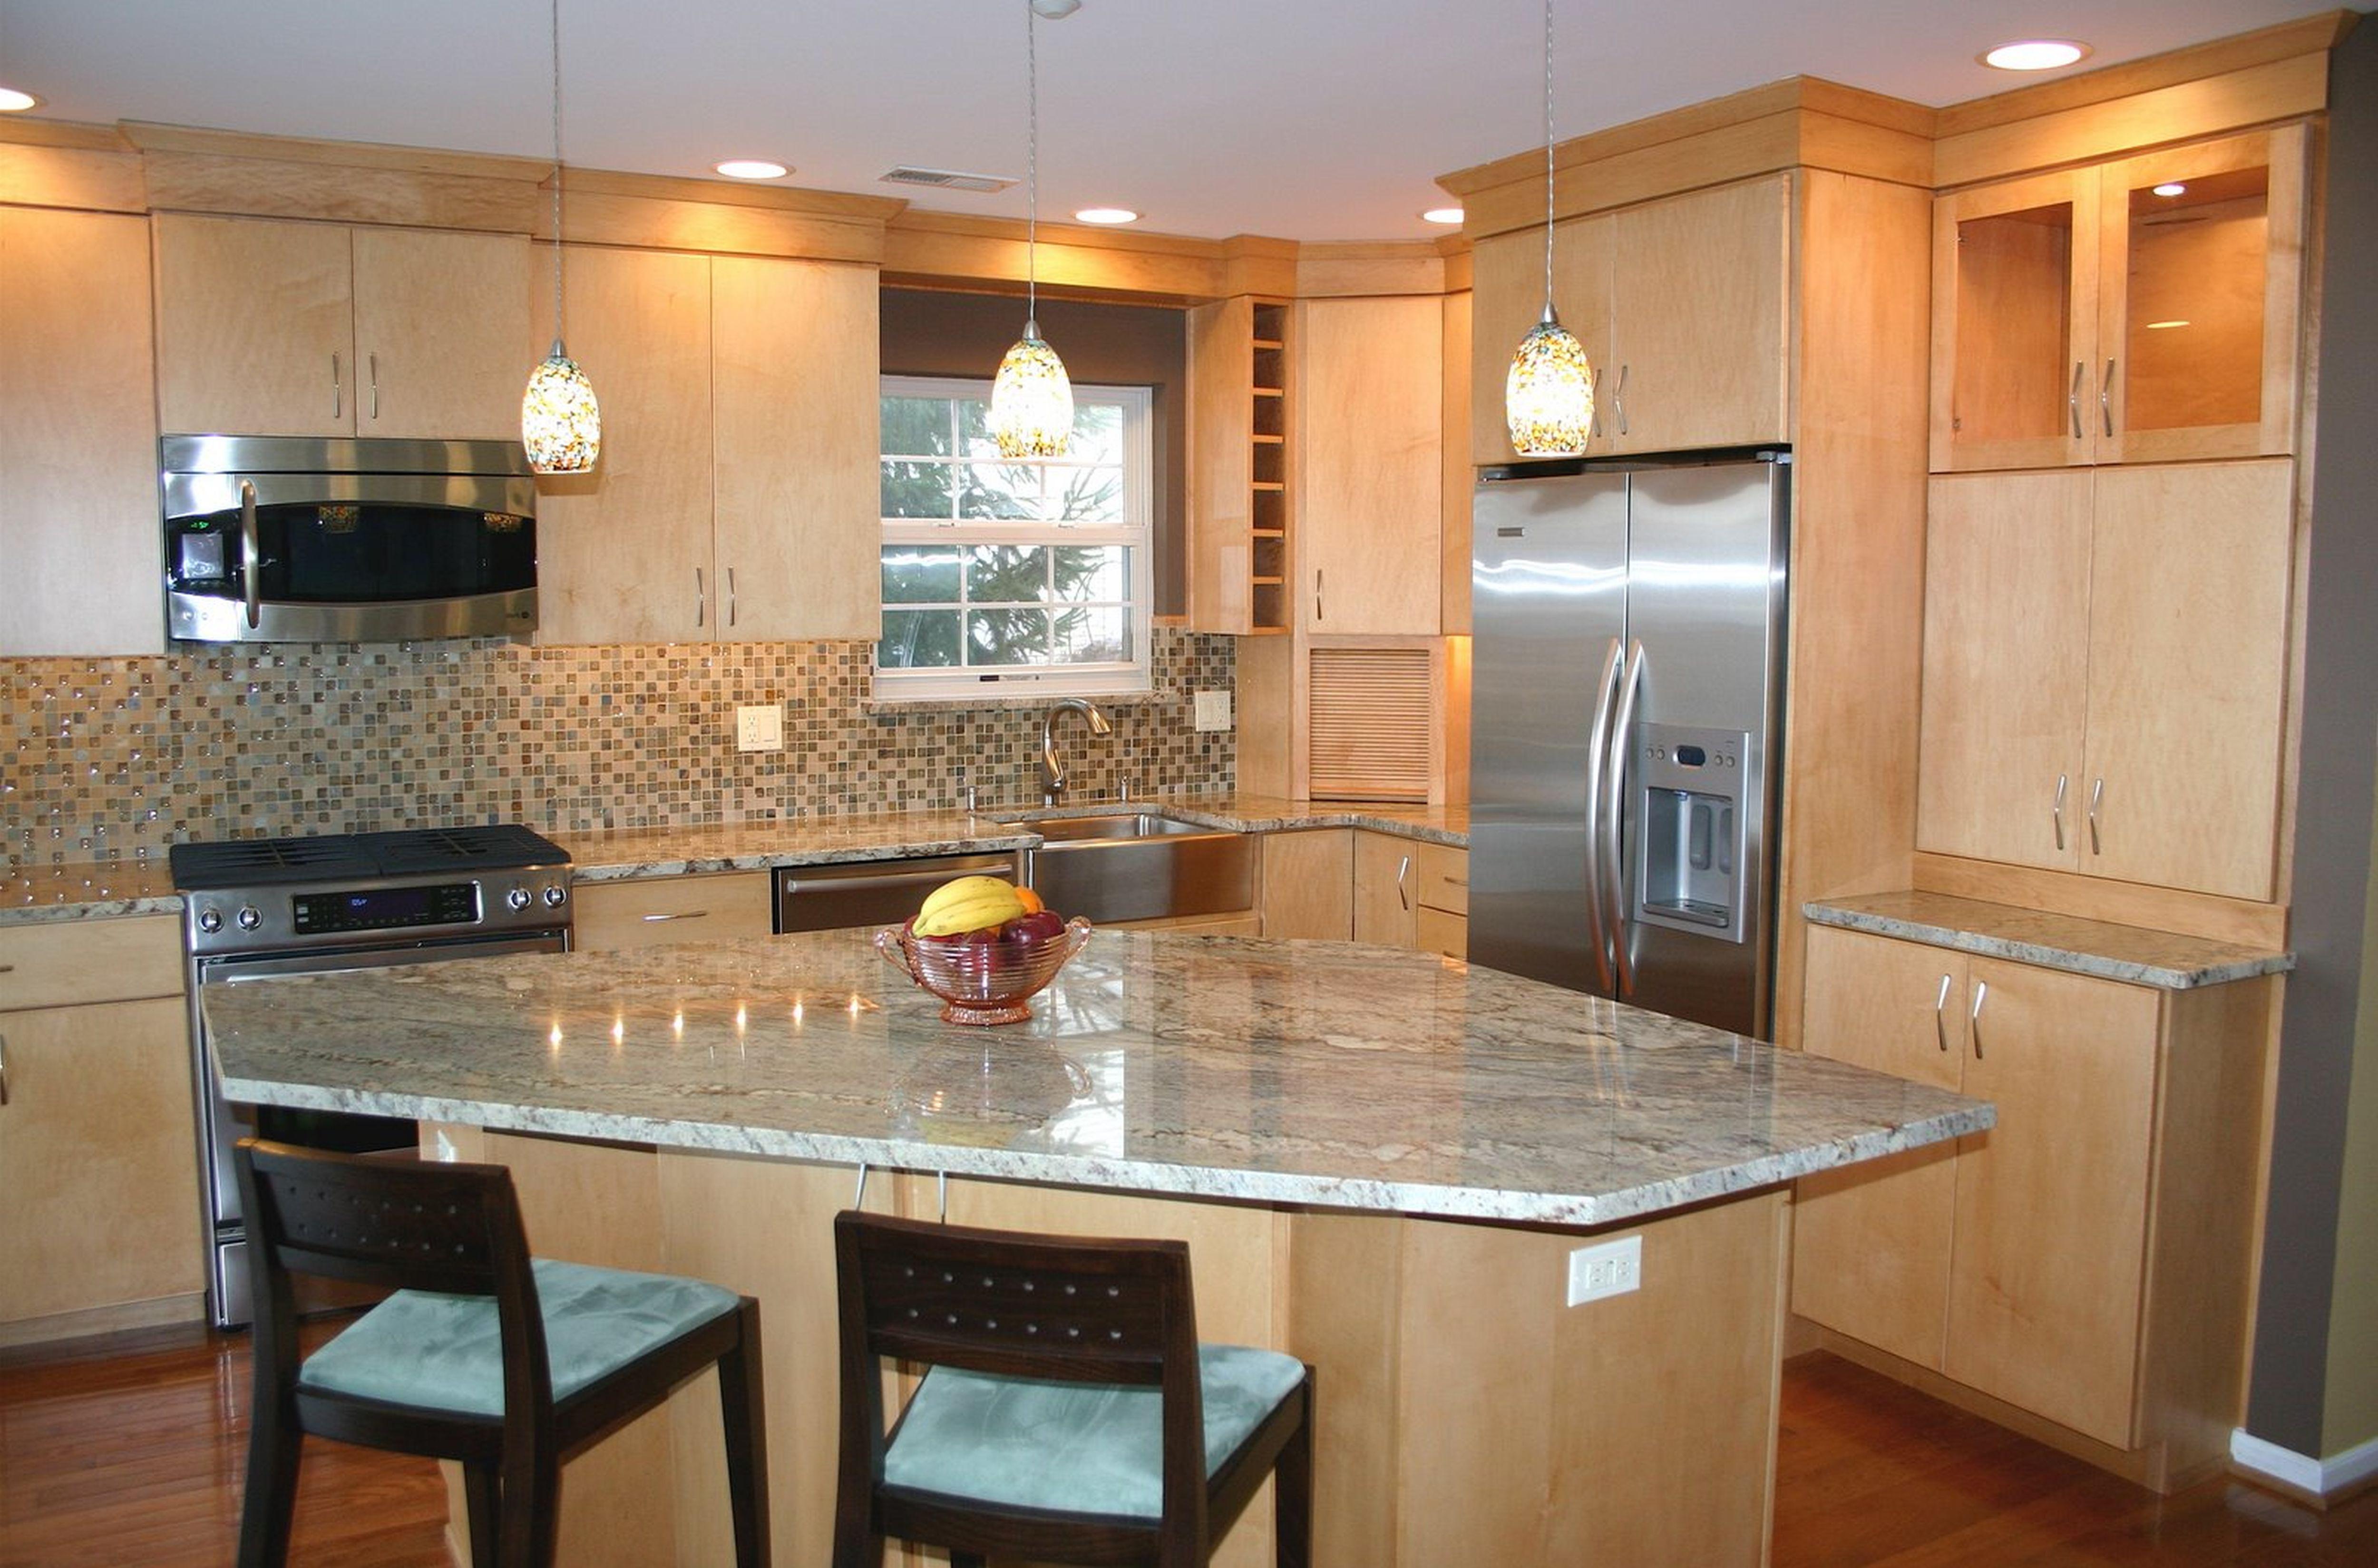 Appealing Tile Backsplash Ideas For Best Kitchen Decoration With Maple Wood Kitchen Cabinet Simple Kitchen Design Kitchen Design Open Kitchen Layout